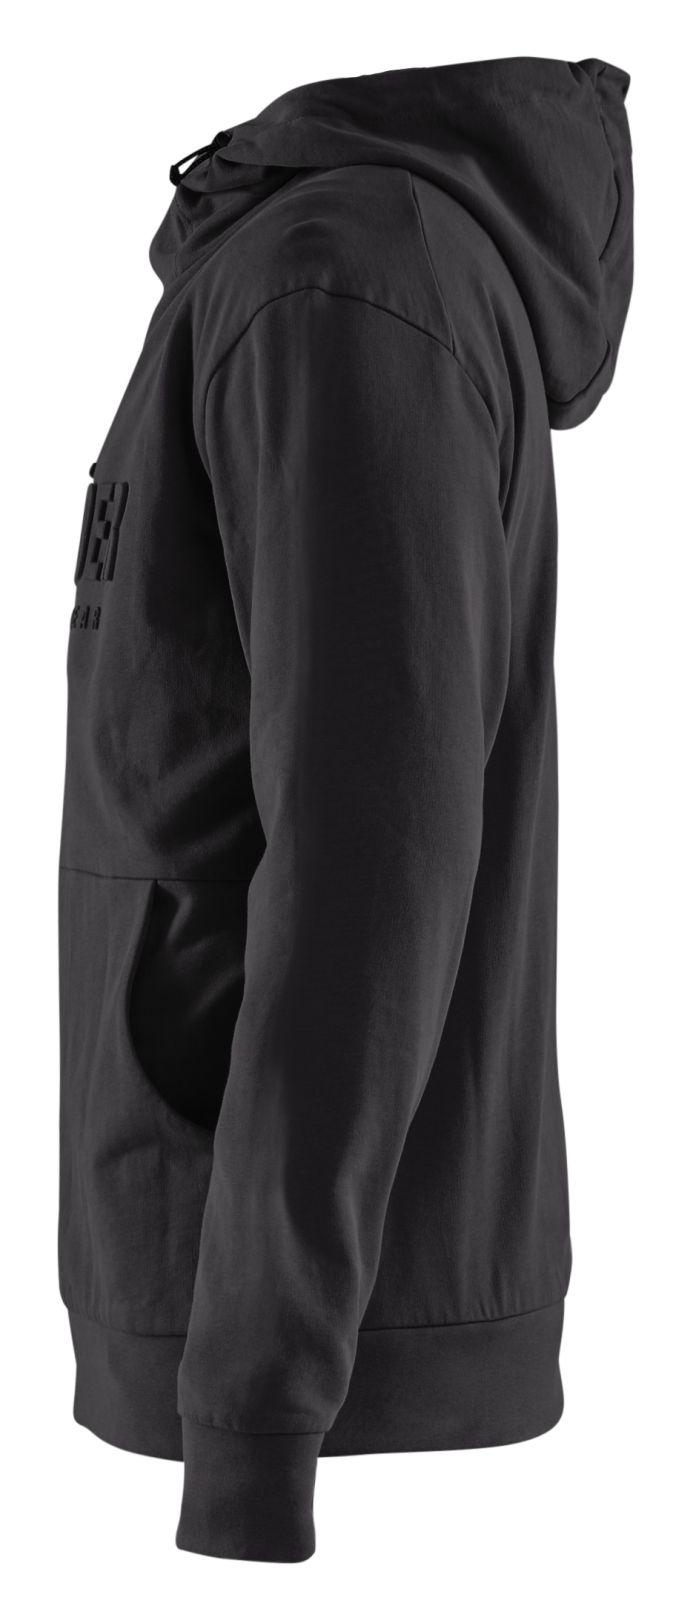 Blaklader sweatershirts 35301158 zwart(9900)